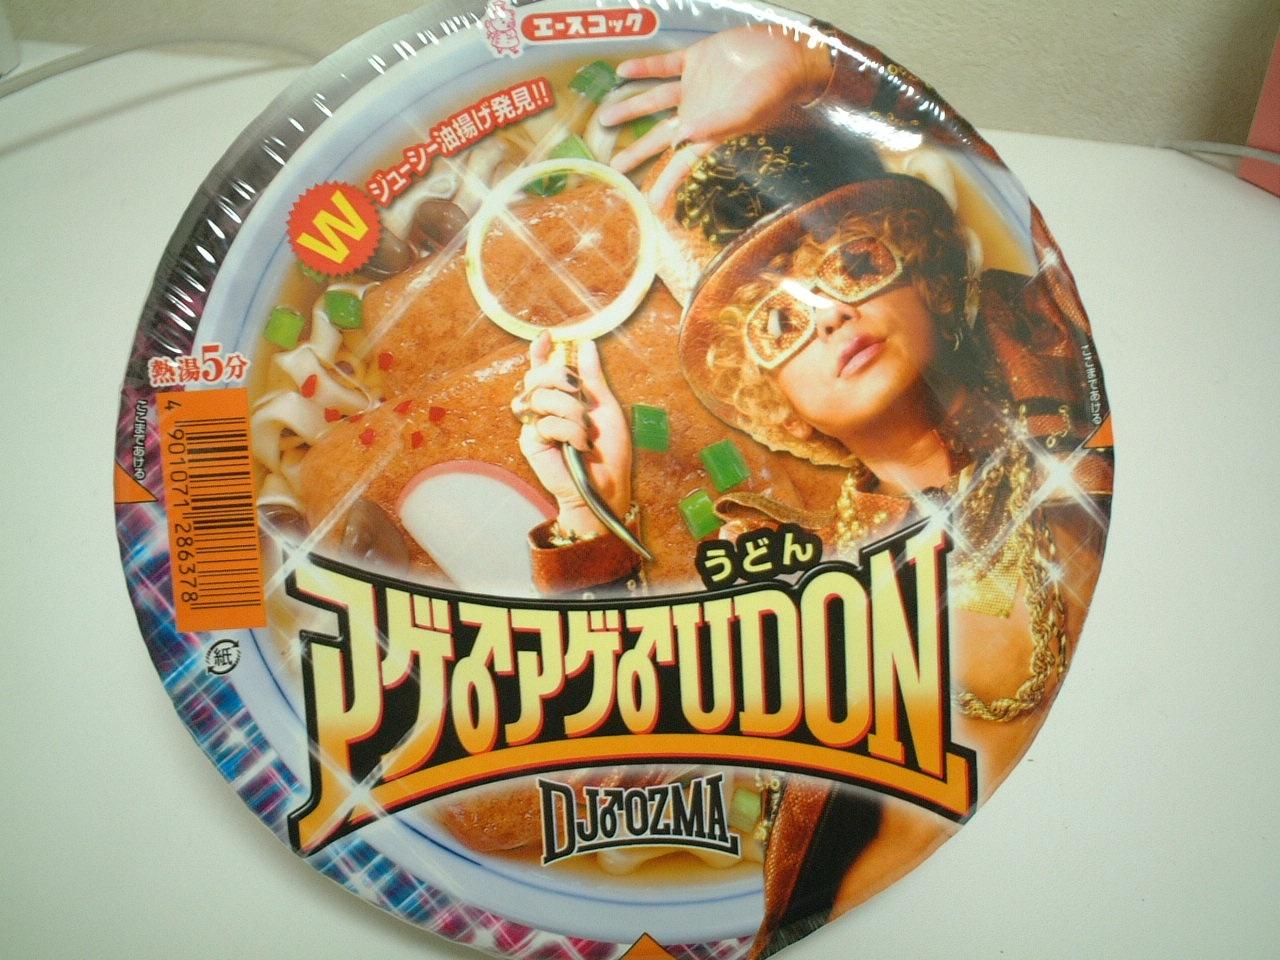 dj ozma DJ OZMAアゲアゲUDON さすが隙のない仕事っぷりw!!!!!  DJ S